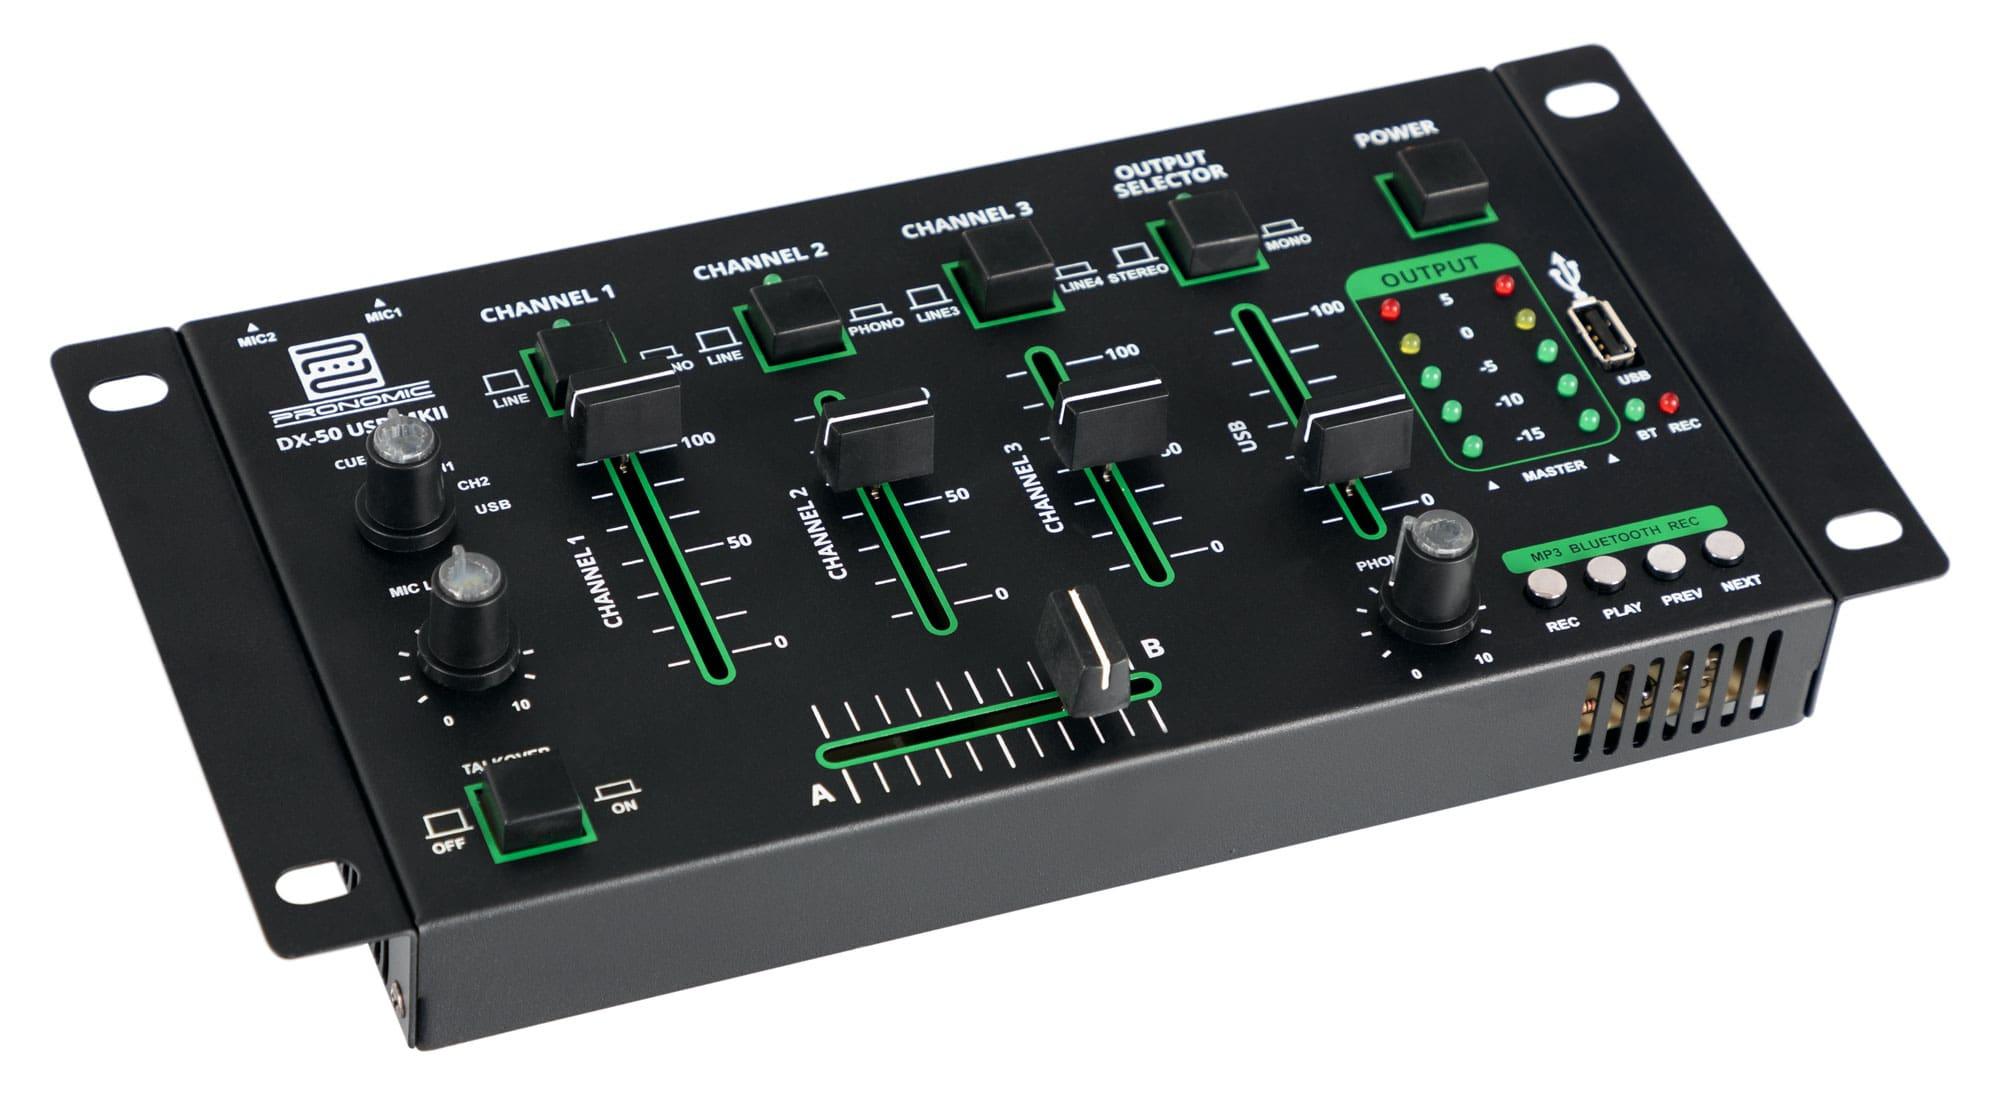 Djmixer - Pronomic DX 50 USB MKII 4 Kanal DJ Mixer mit Bluetooth - Onlineshop Musikhaus Kirstein